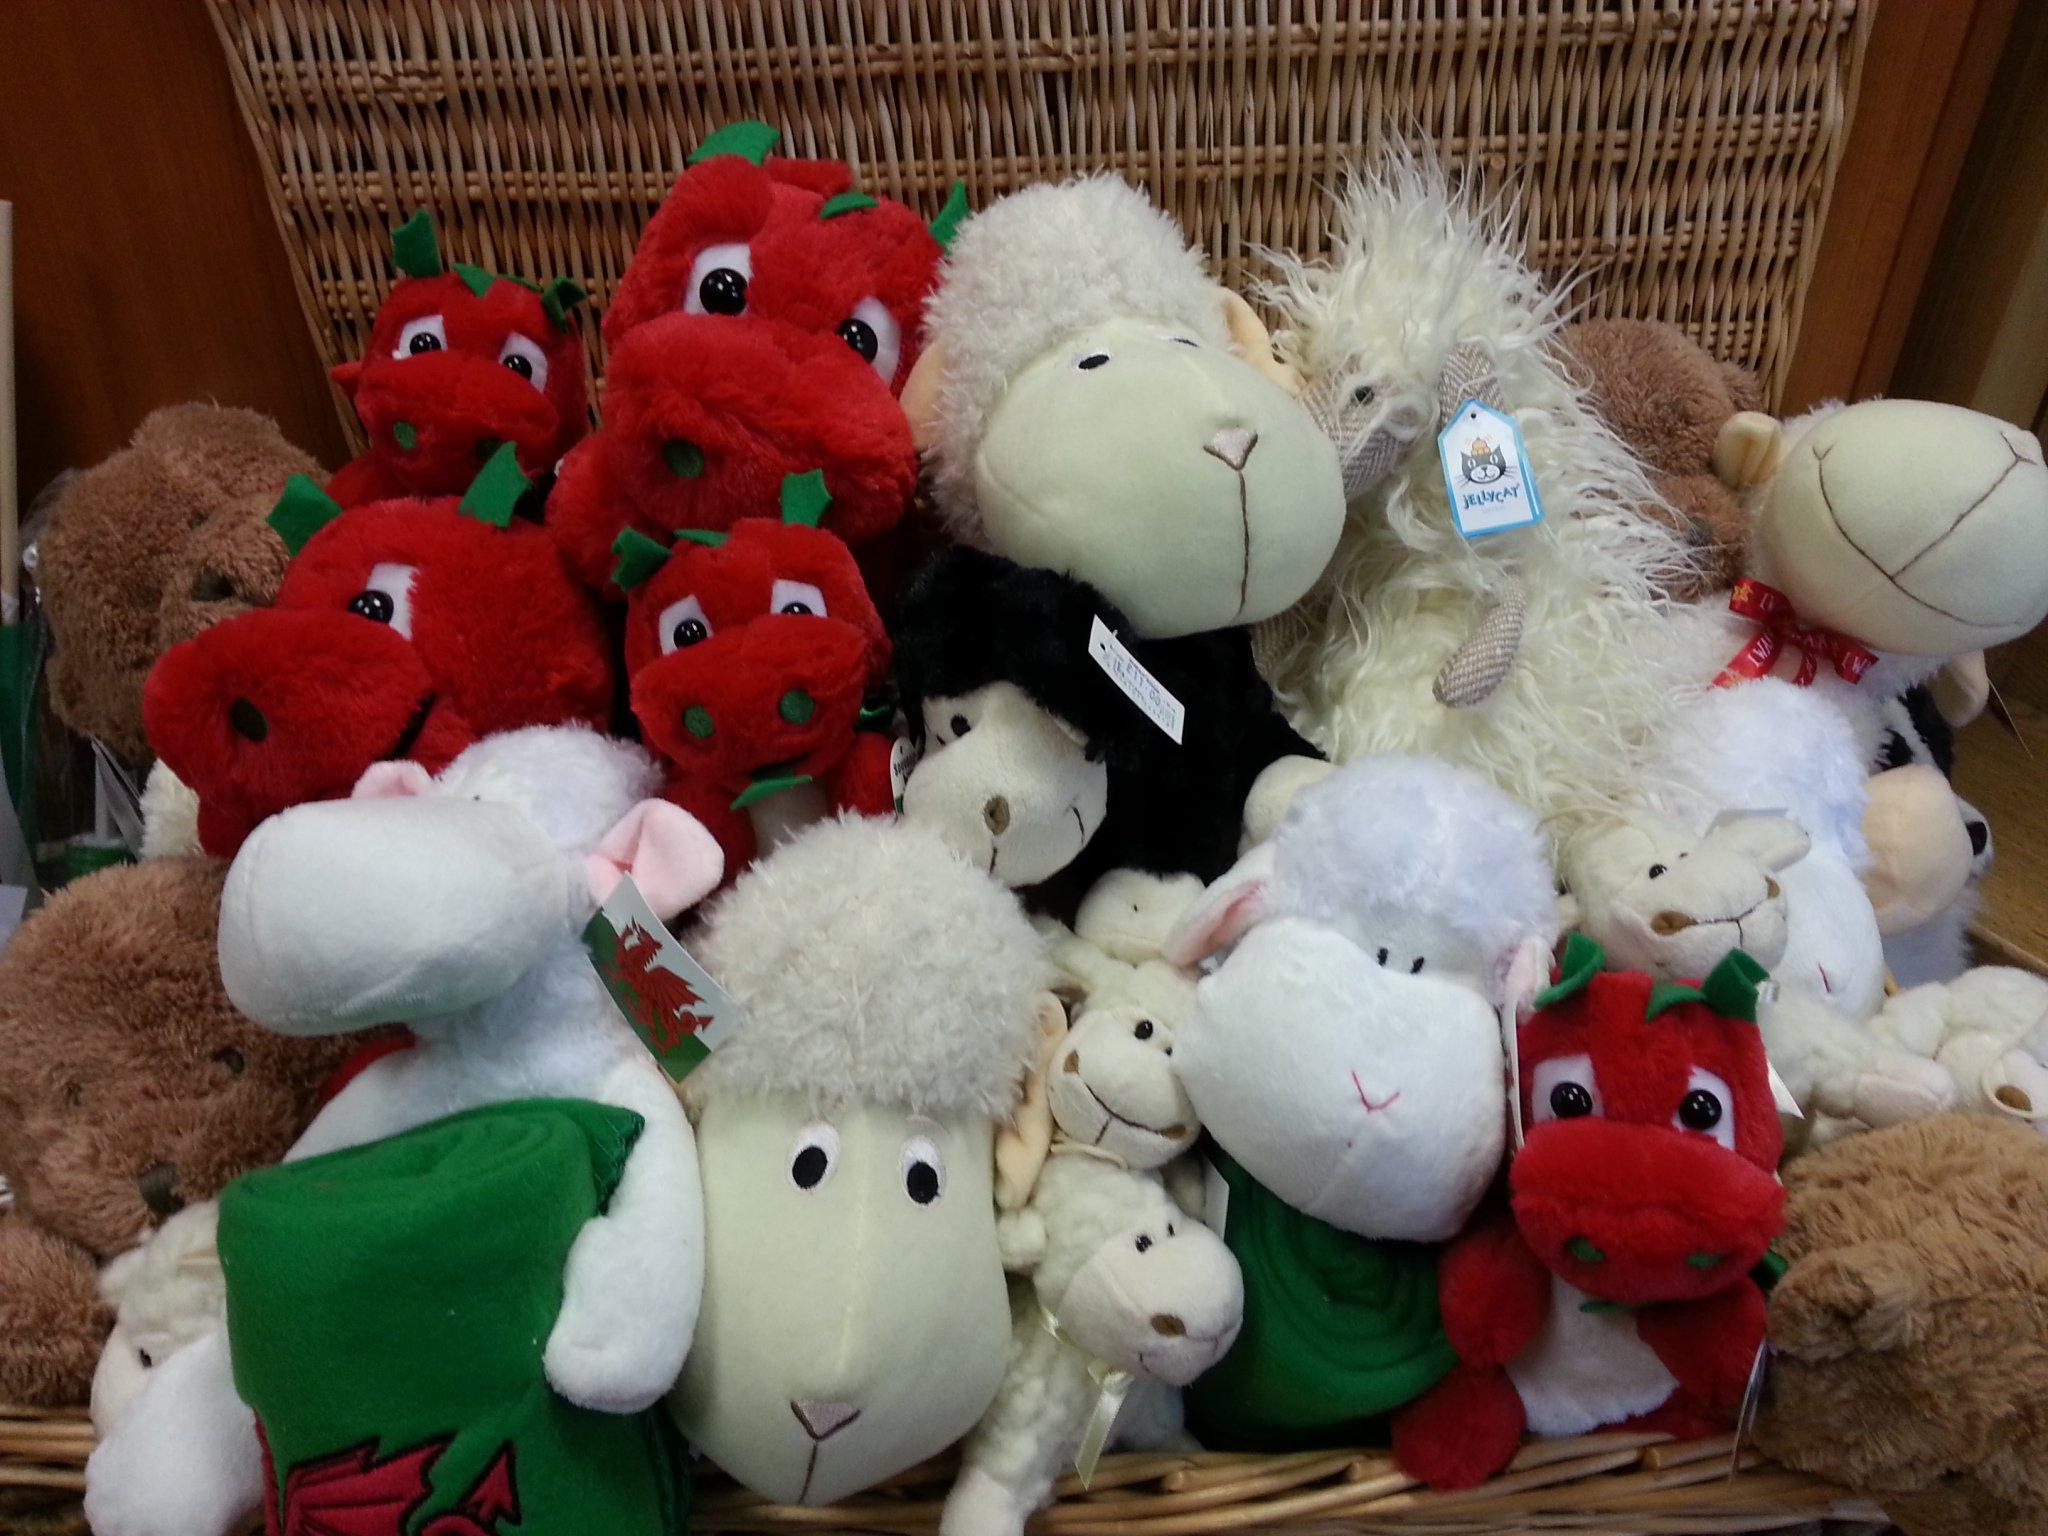 cuddly toys, dragons, sheep